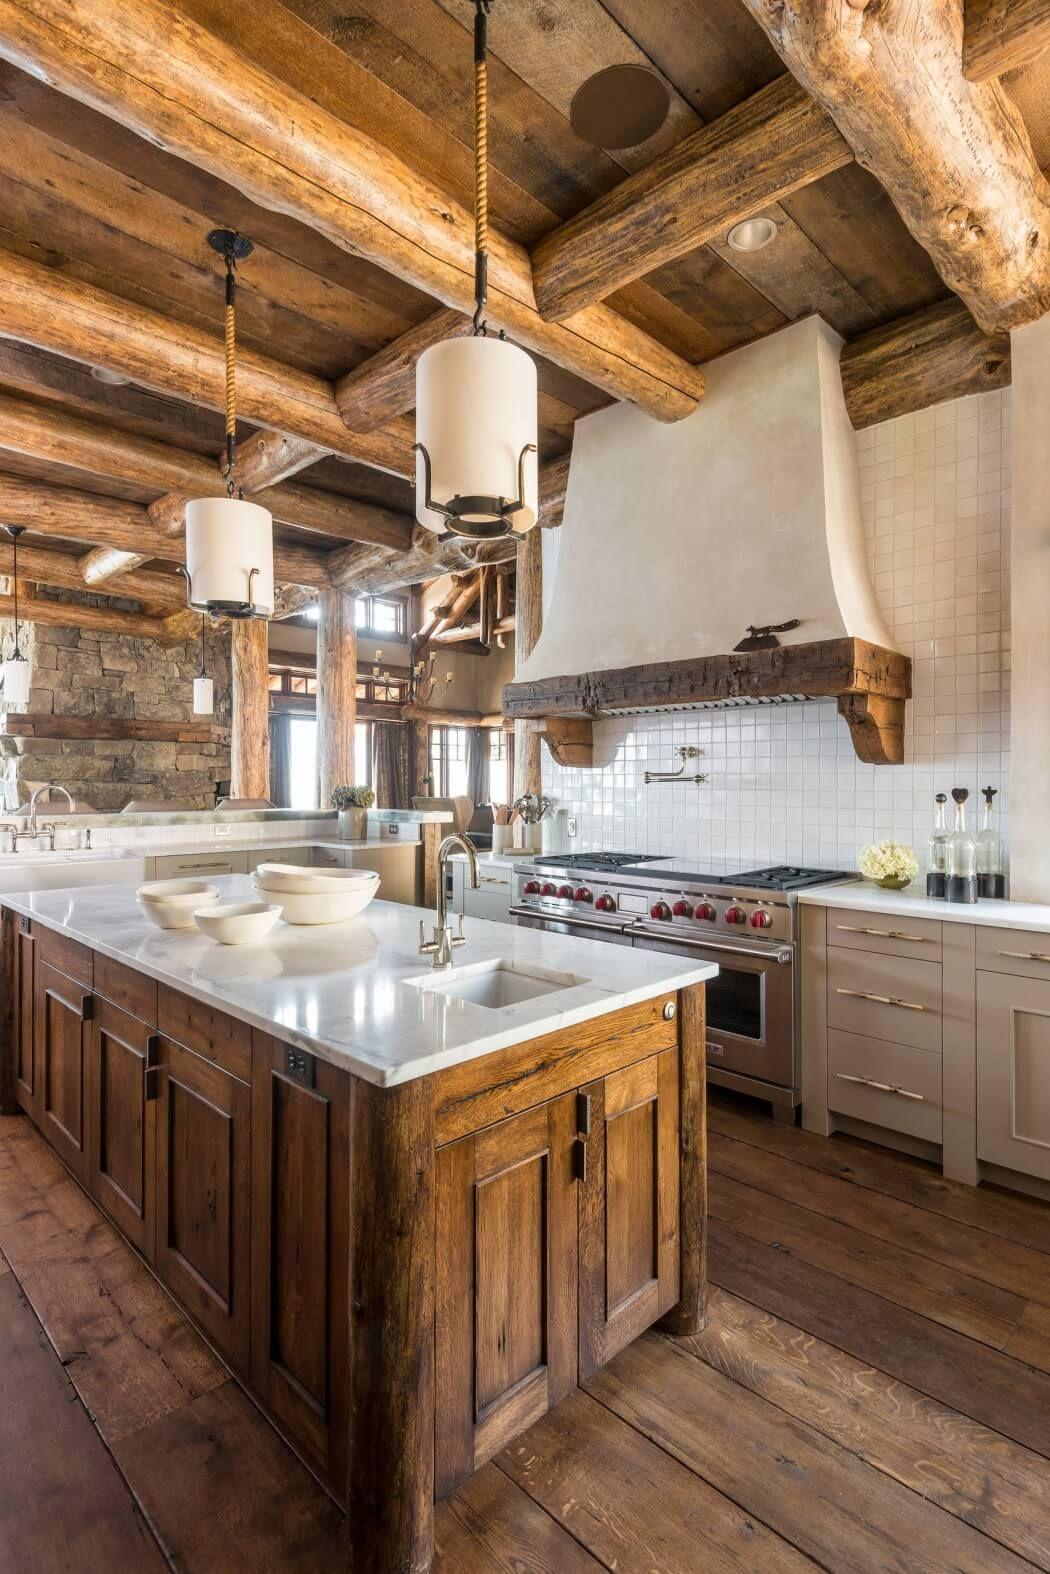 Cabin Kitchen Design Creative cedar viewpearson design group | homeadore | | mountain modern